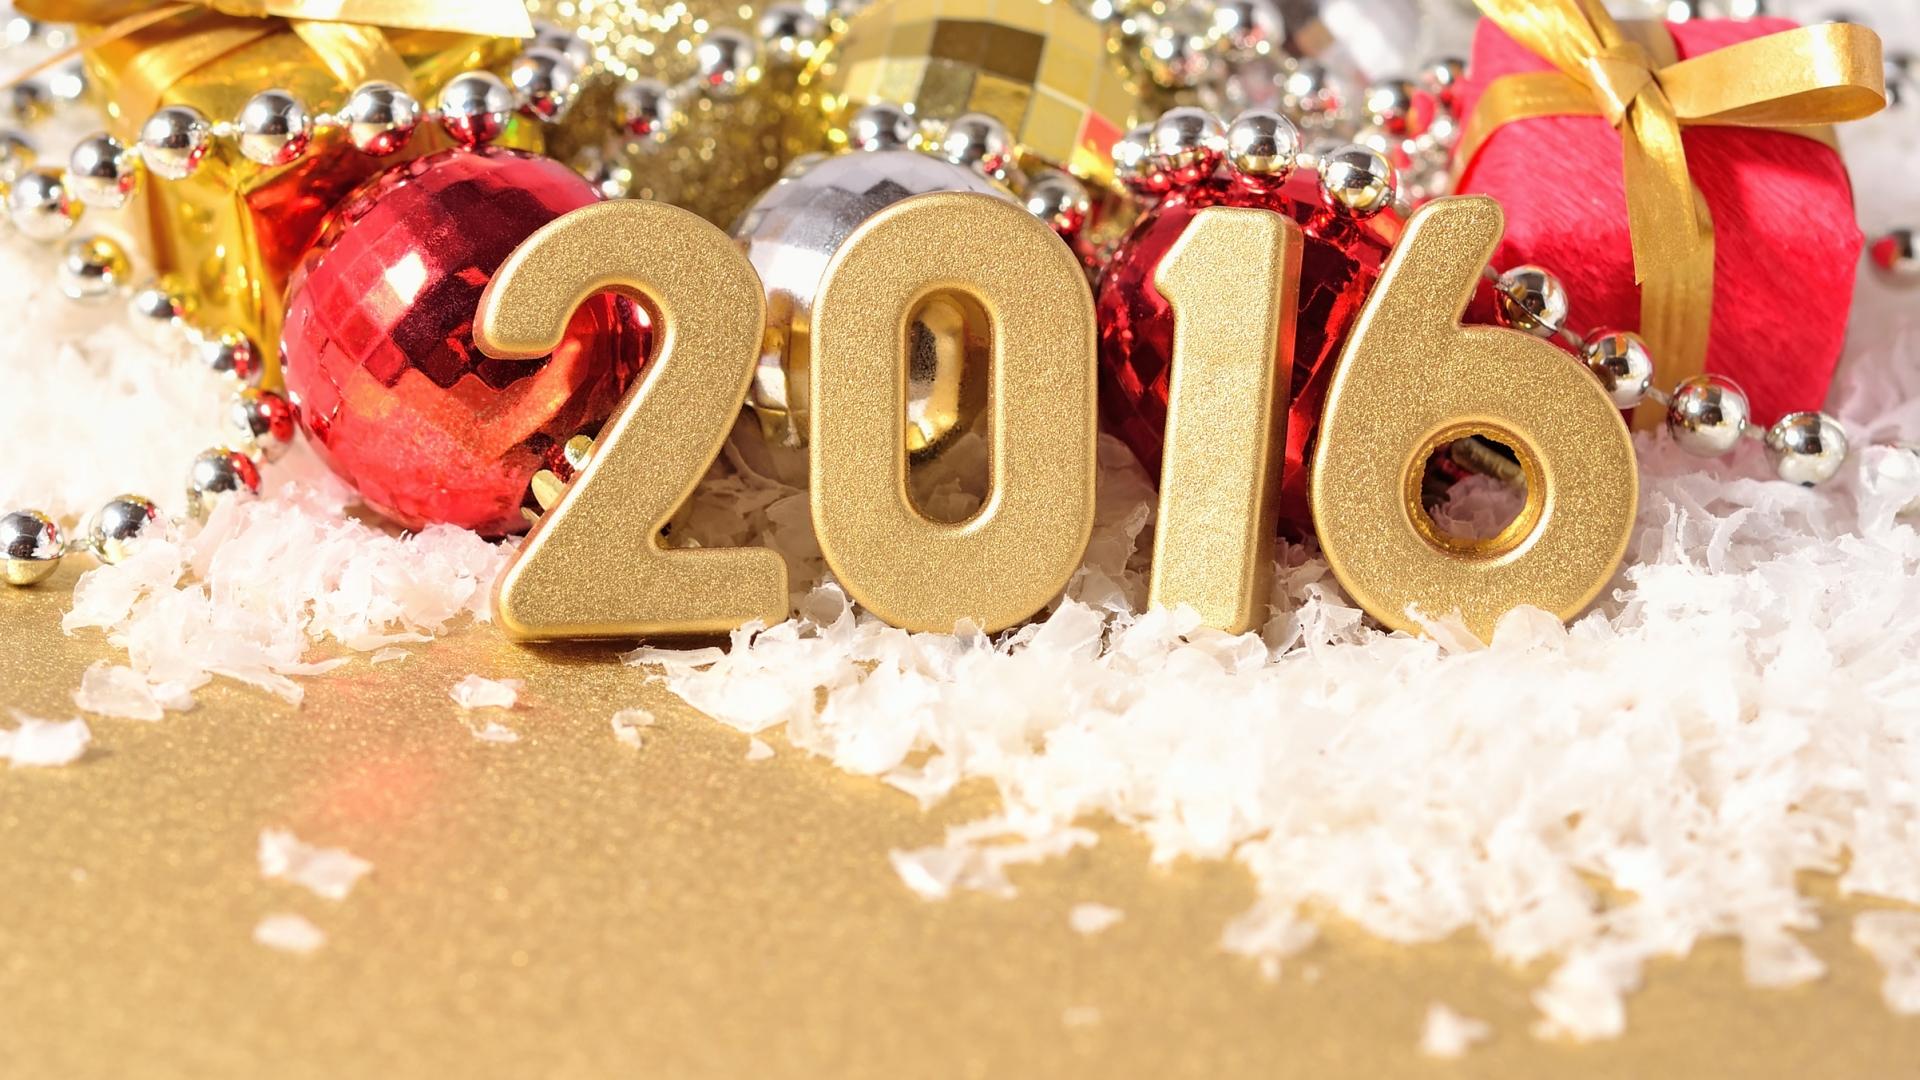 Fondos De Pantalla Hd Navidad 2016: Merry Christmas 2016 1920x1080